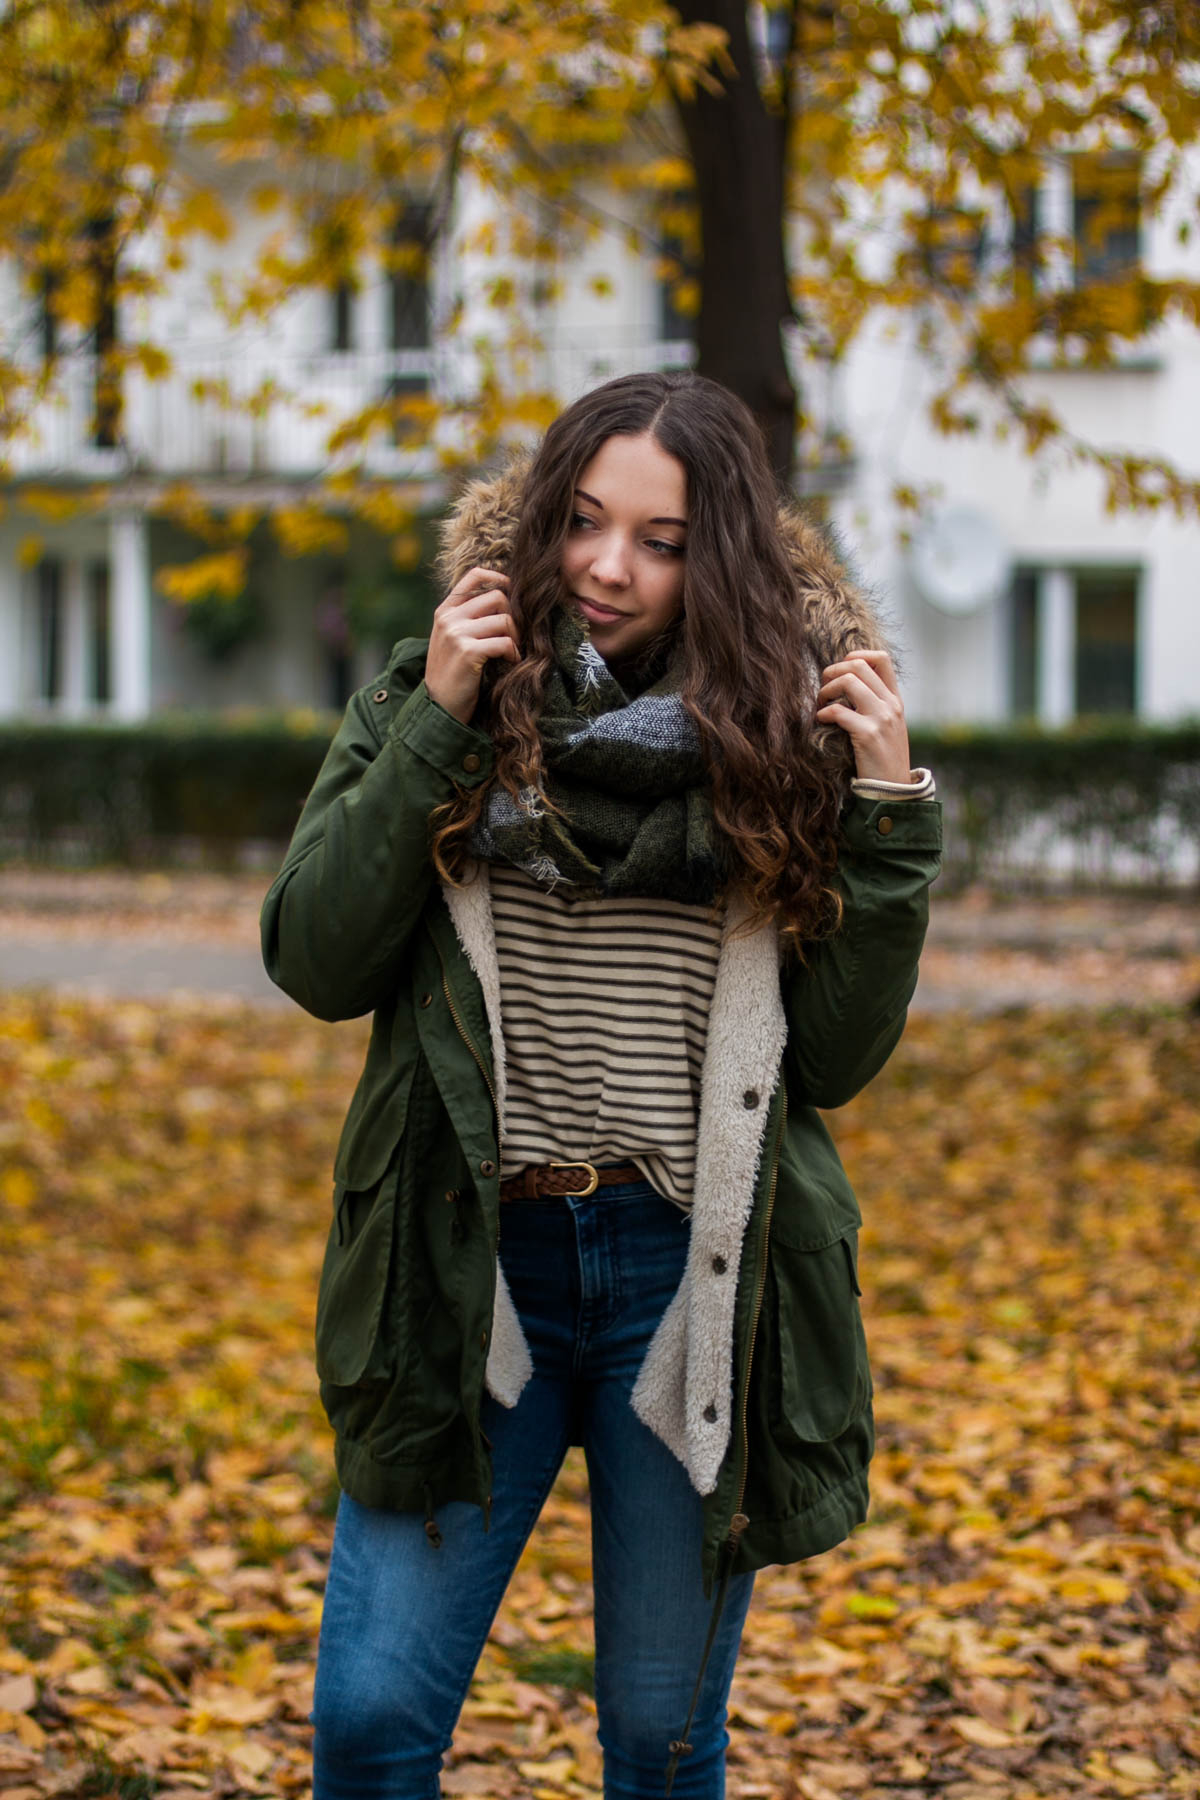 timberlandy jesienna kurtka parka i jeansy